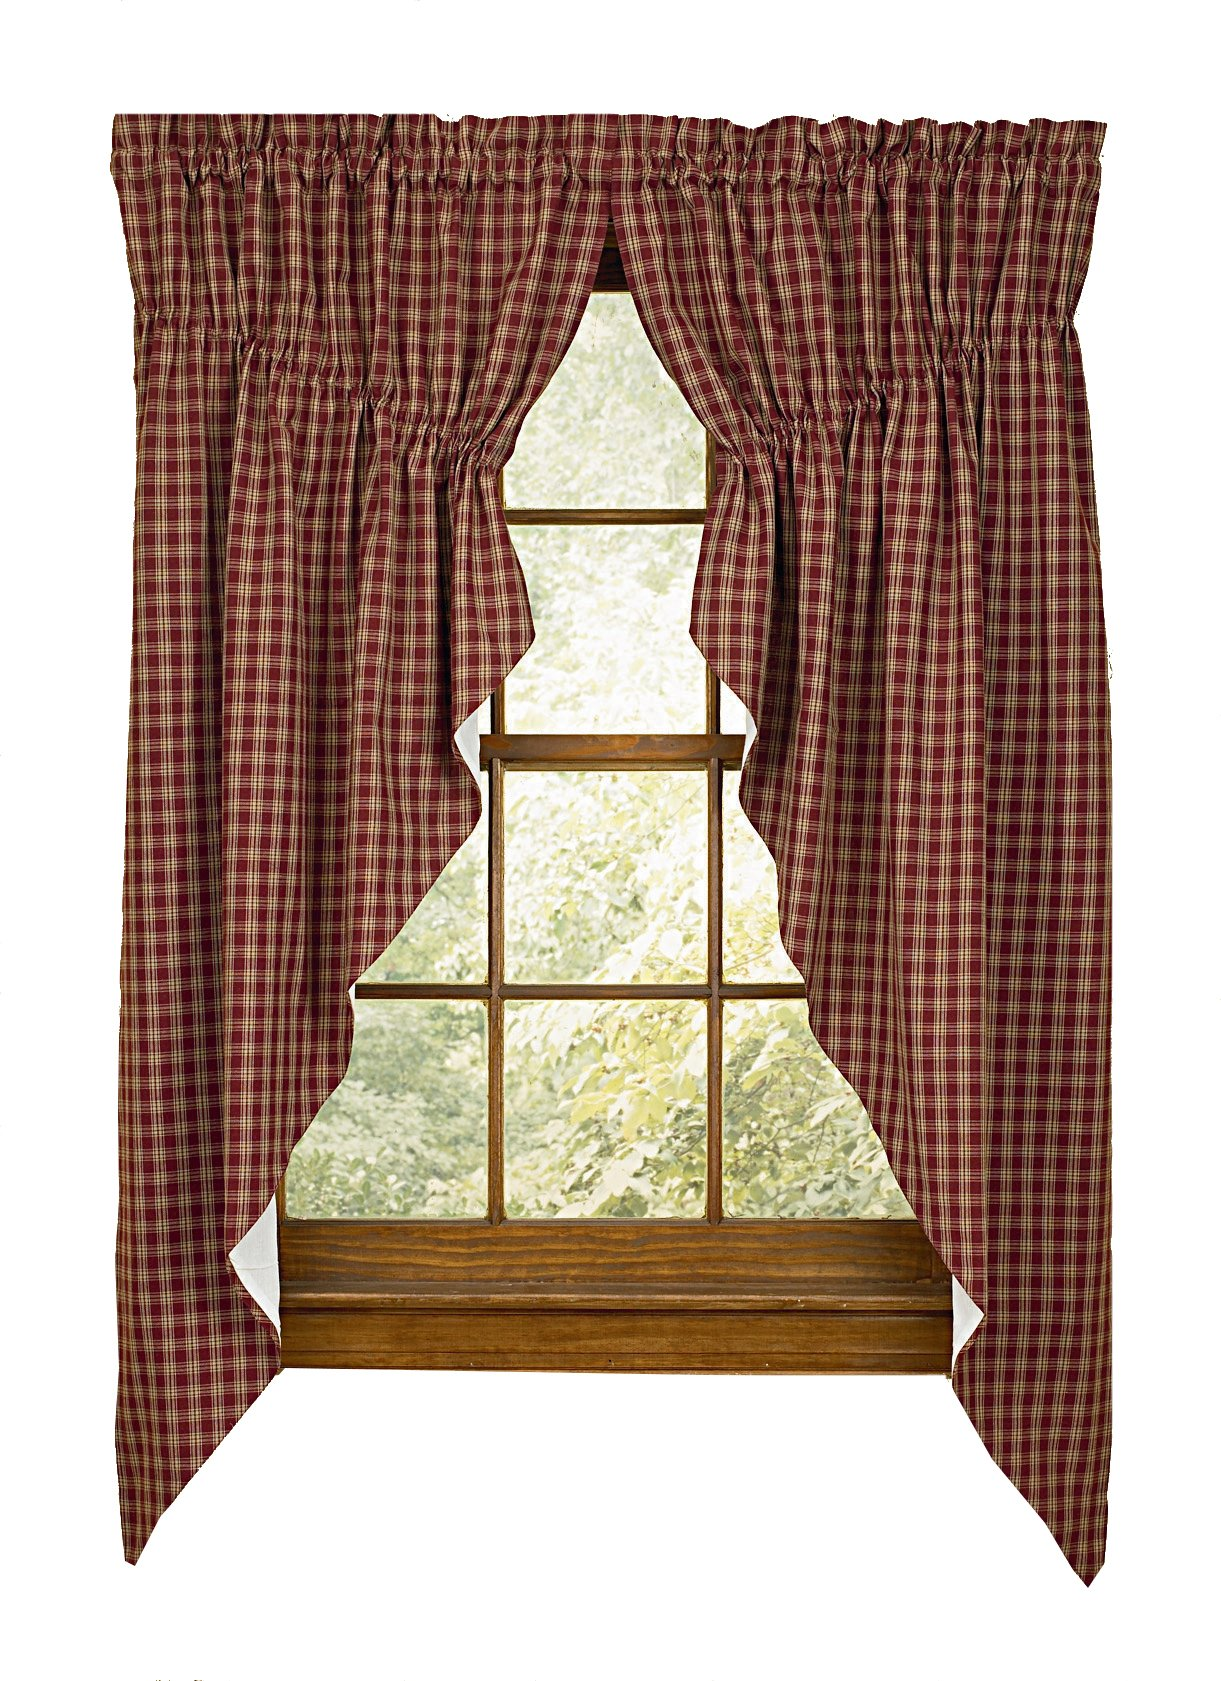 Sturbridge Park Designs 72''x 63'' Wine Prairie Curtains by Park Designs